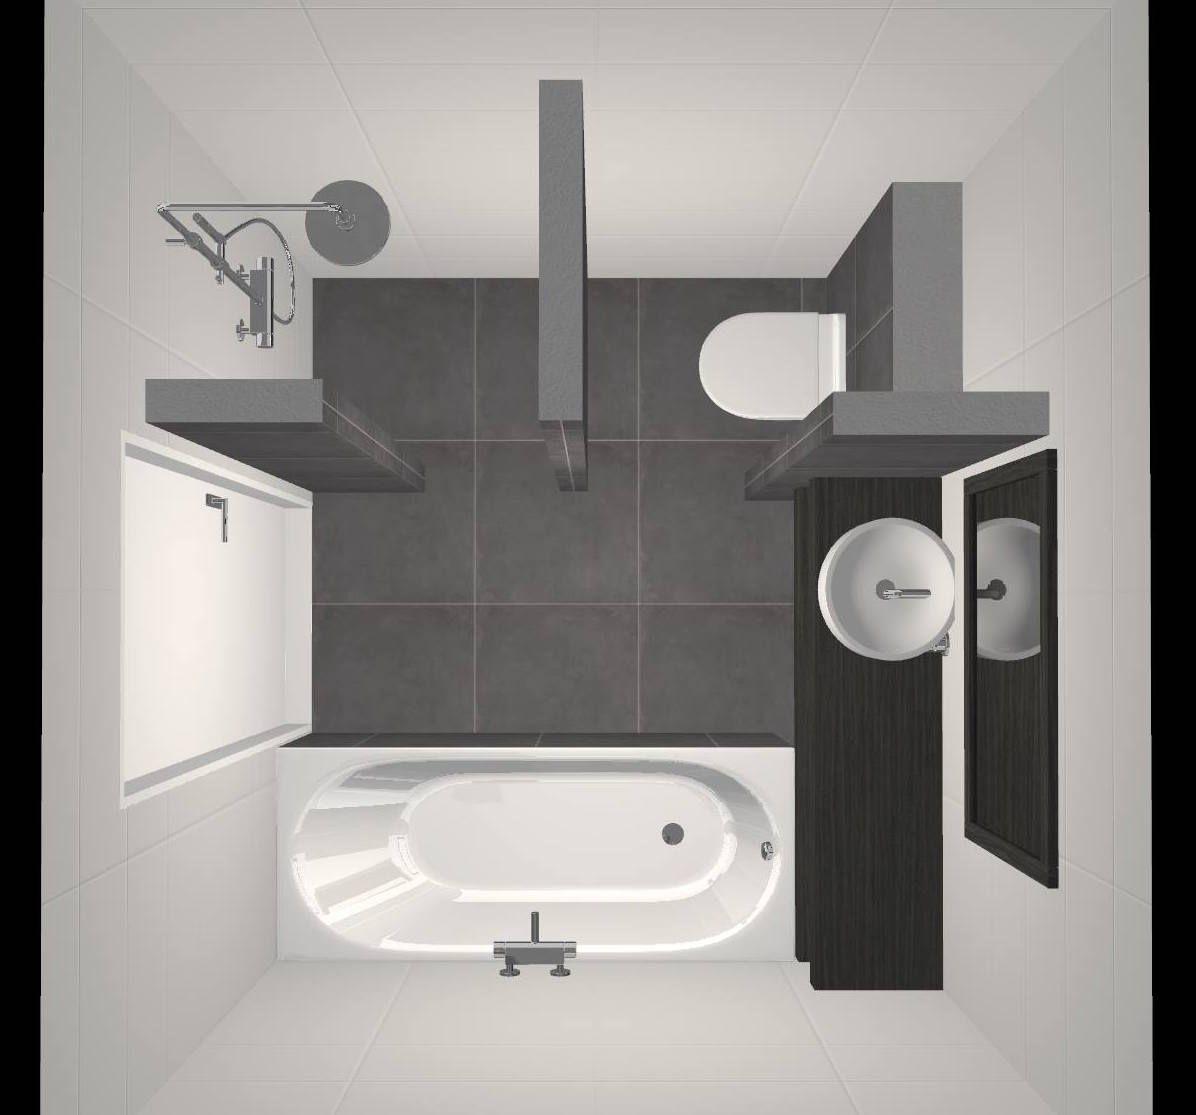 Kleine badkamer met douche bad wastafel en toilet ontwerp beniers badkamers foto 2 - Badkamer wc ...